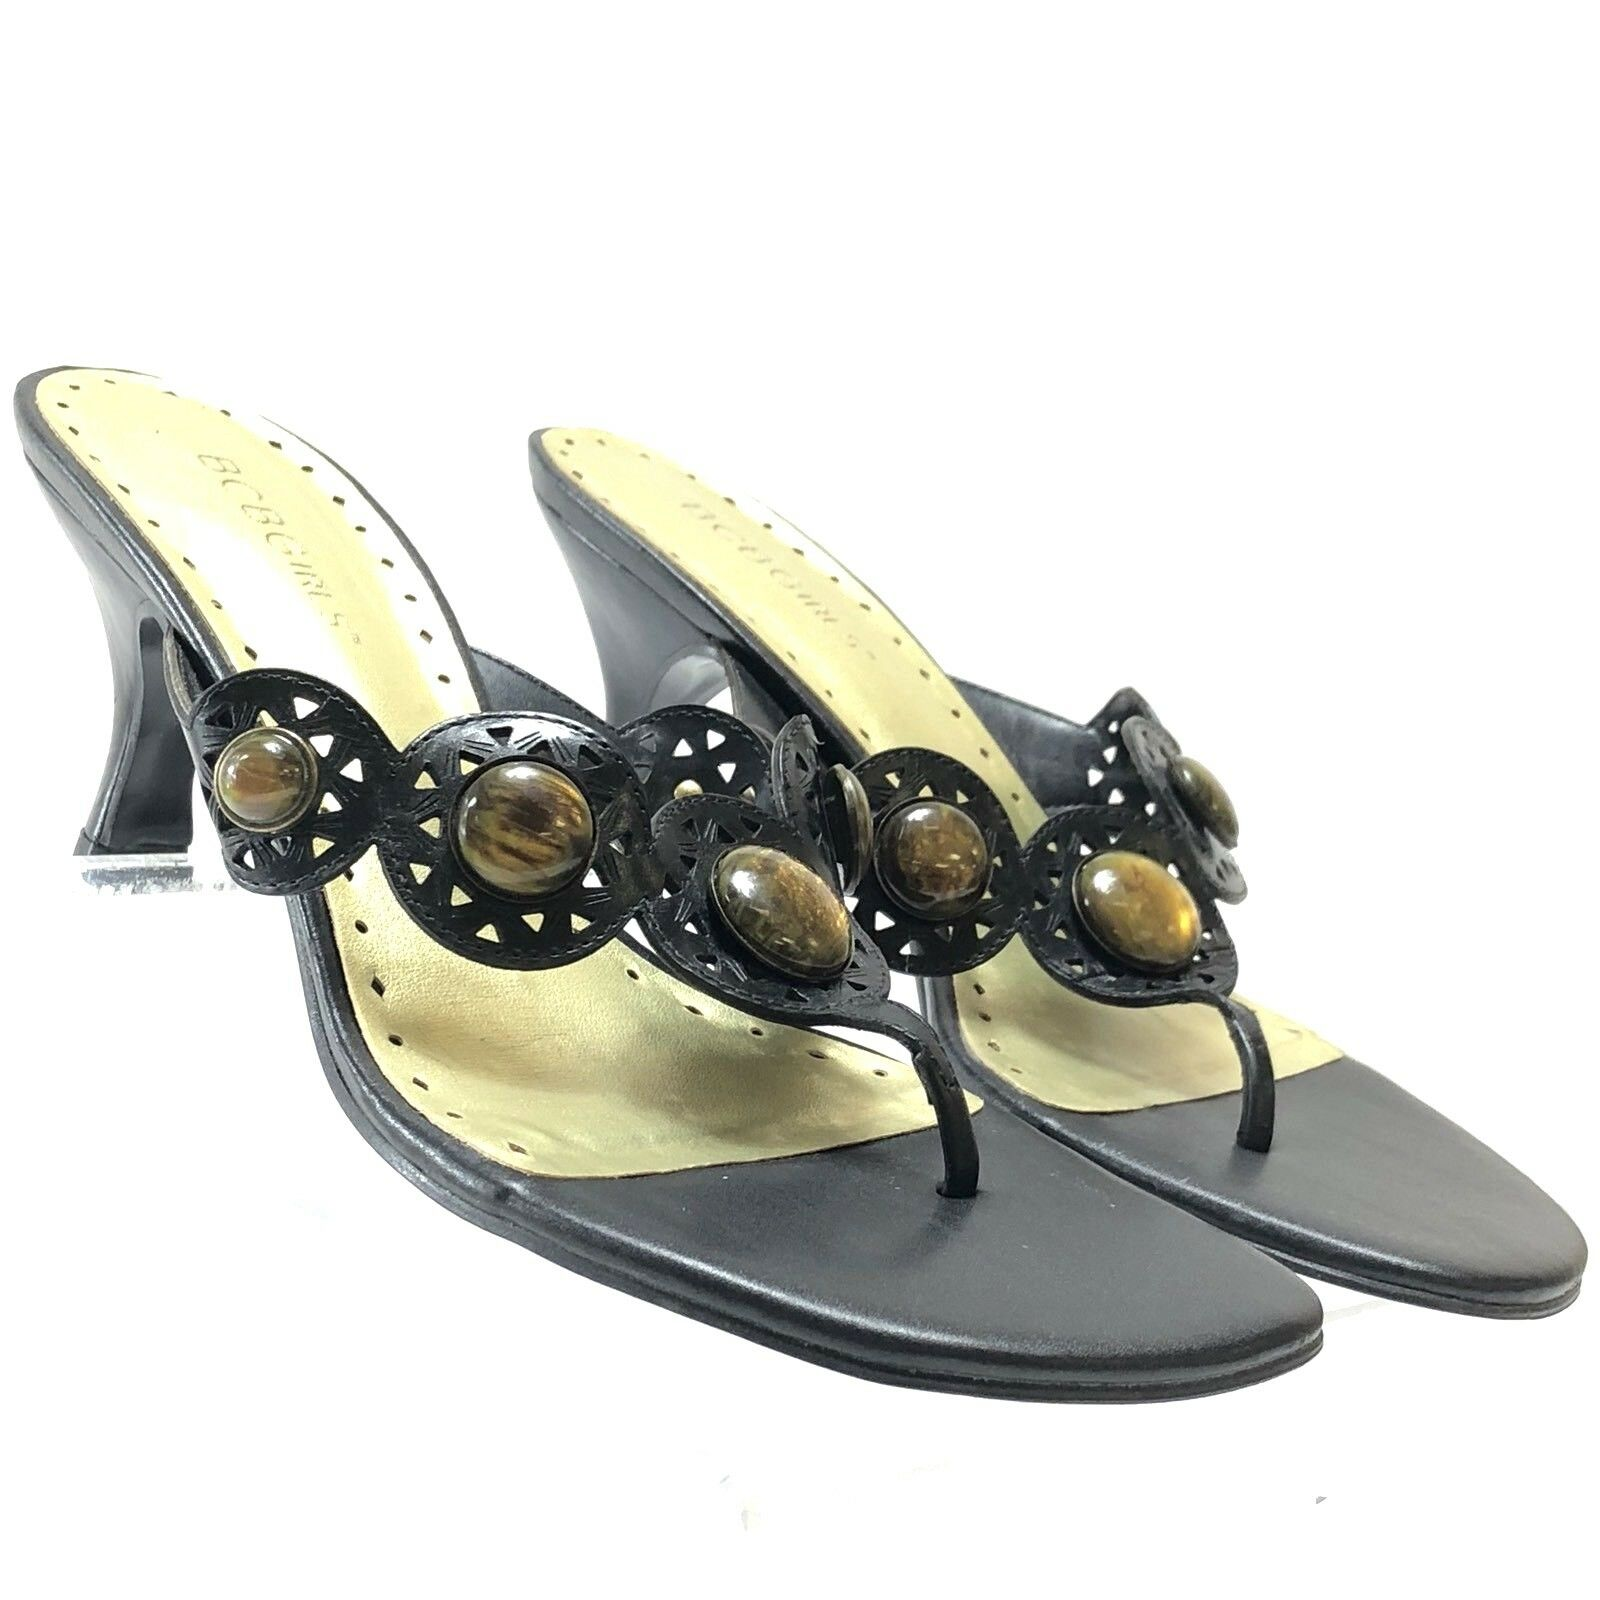 Women's BCBGIRLS Brown leather Thongs (c37) Embellished Sandals Size 7B (c37) Thongs ec6946